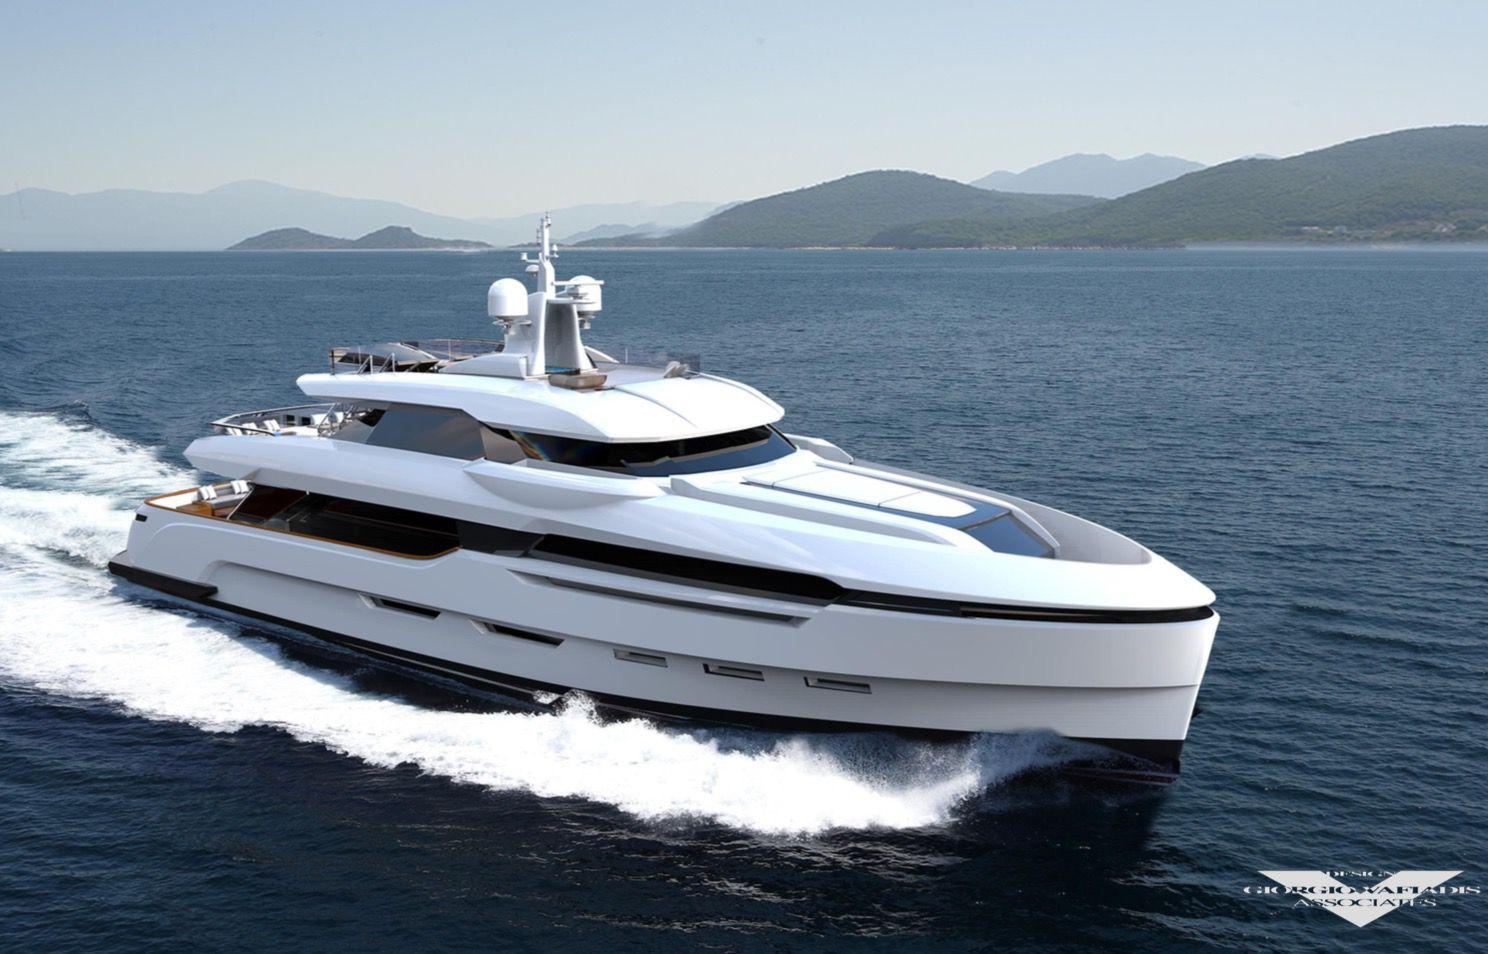 Luxury yacht for Sale | CCN 33m DOM by CCN - Cerri Cantieri Navali